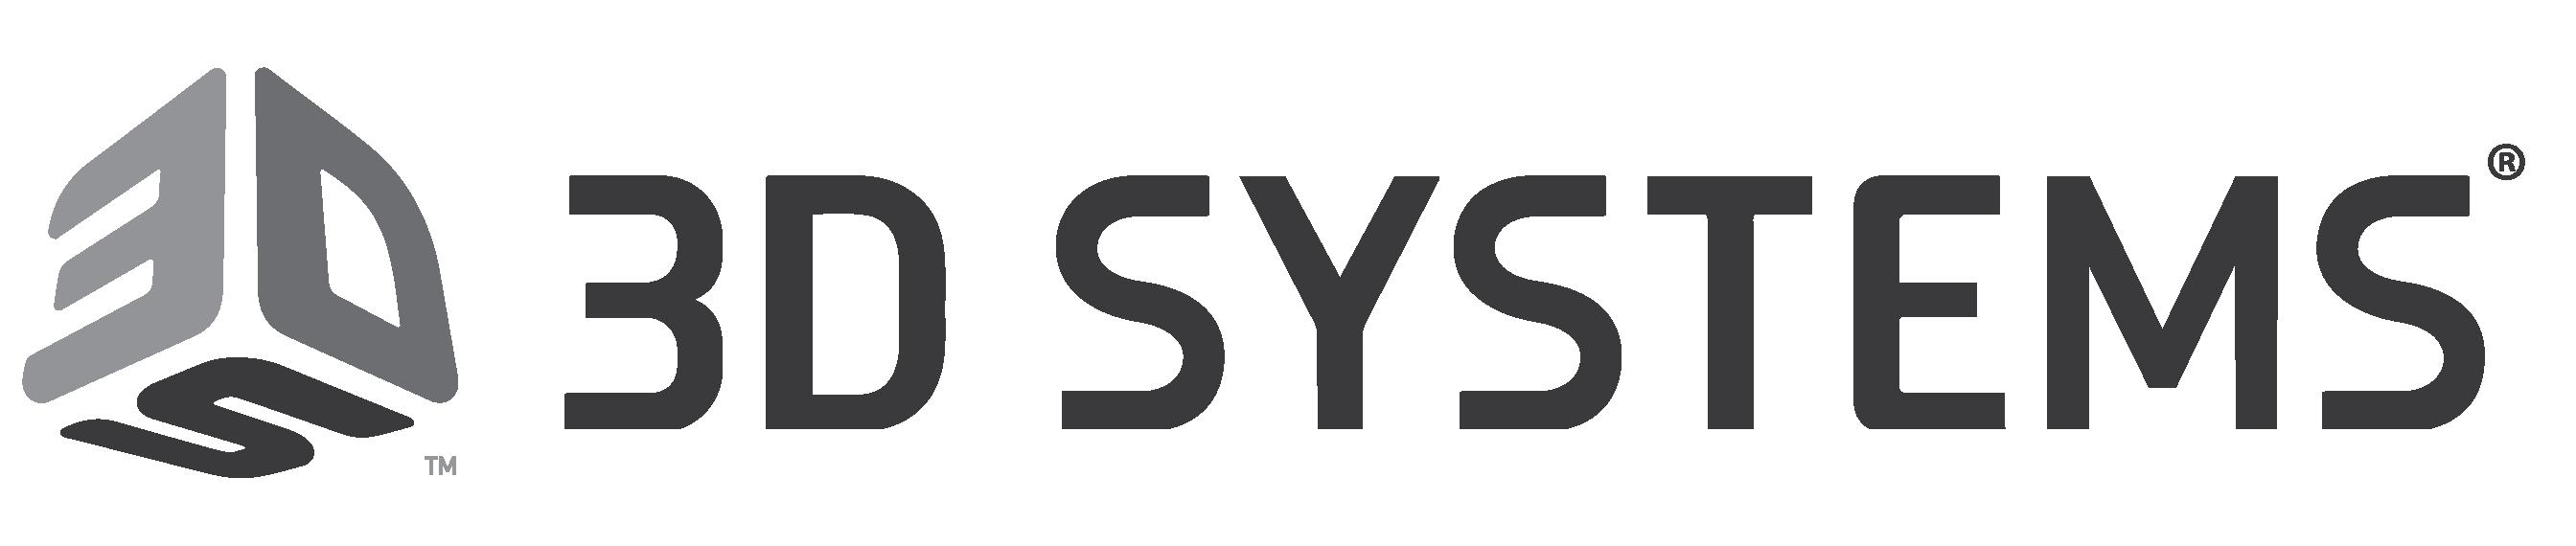 Projet 3D System